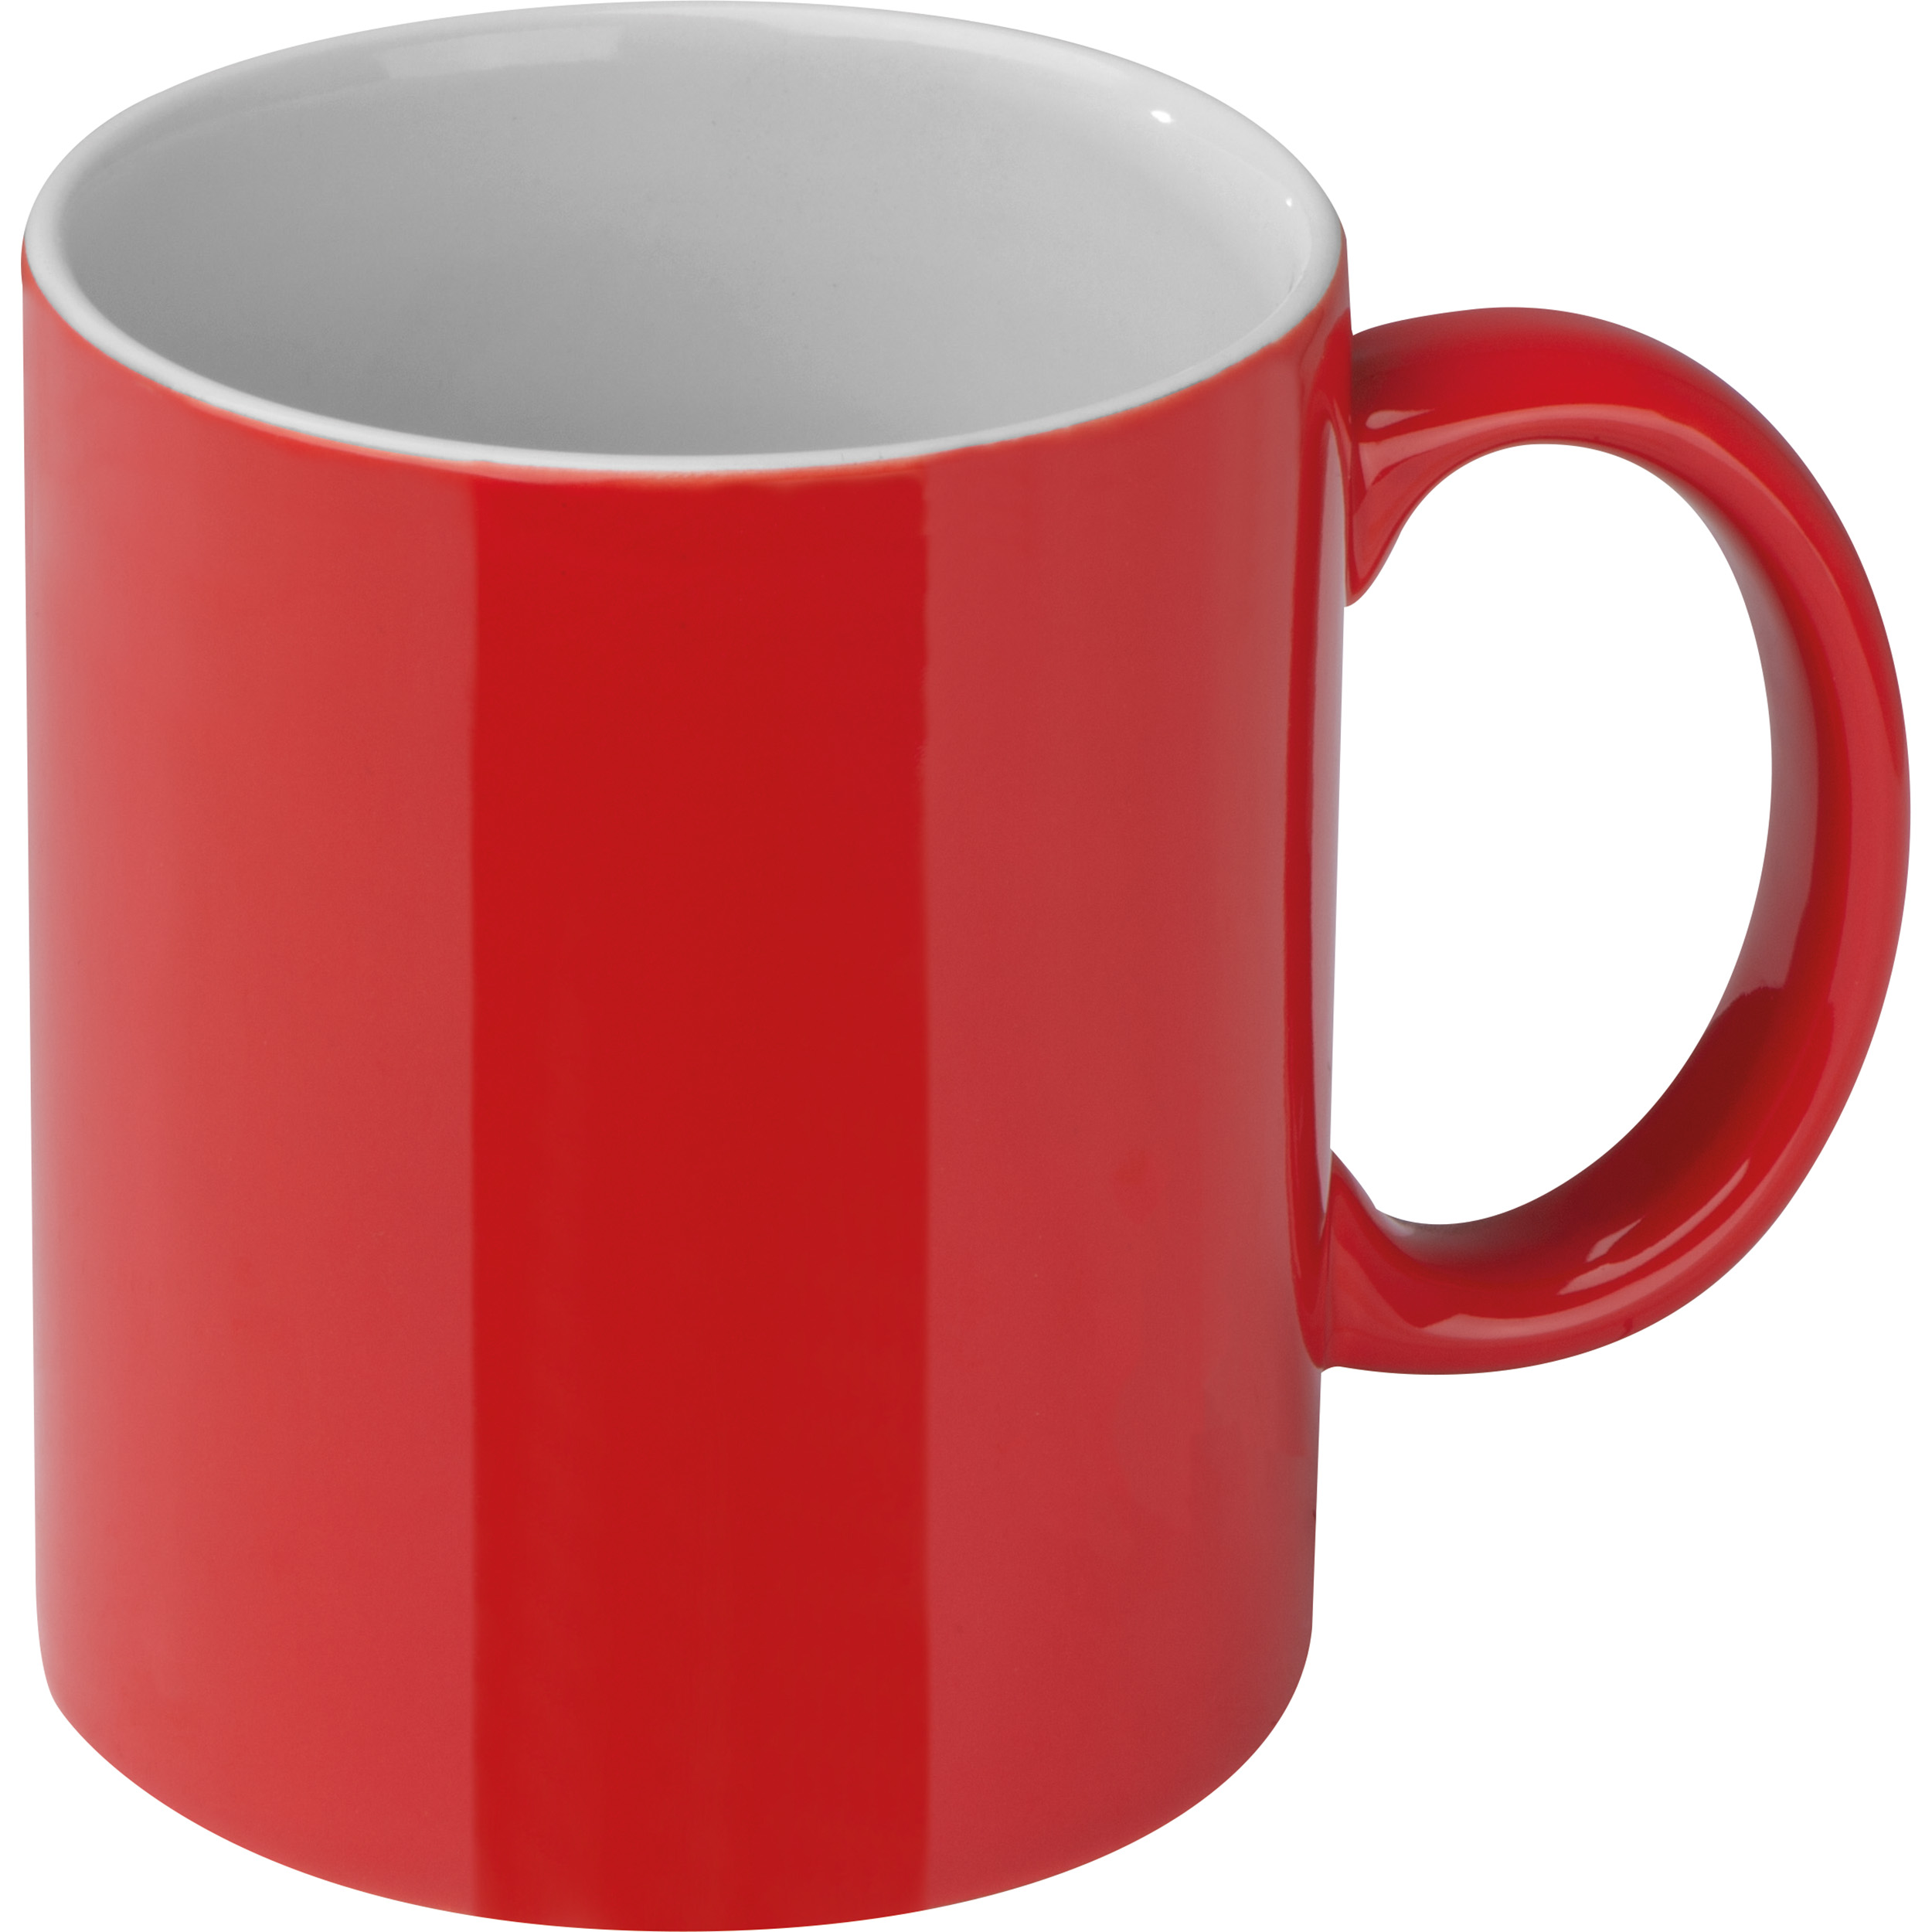 Kaffeetasse aus Keramik , 300 ml